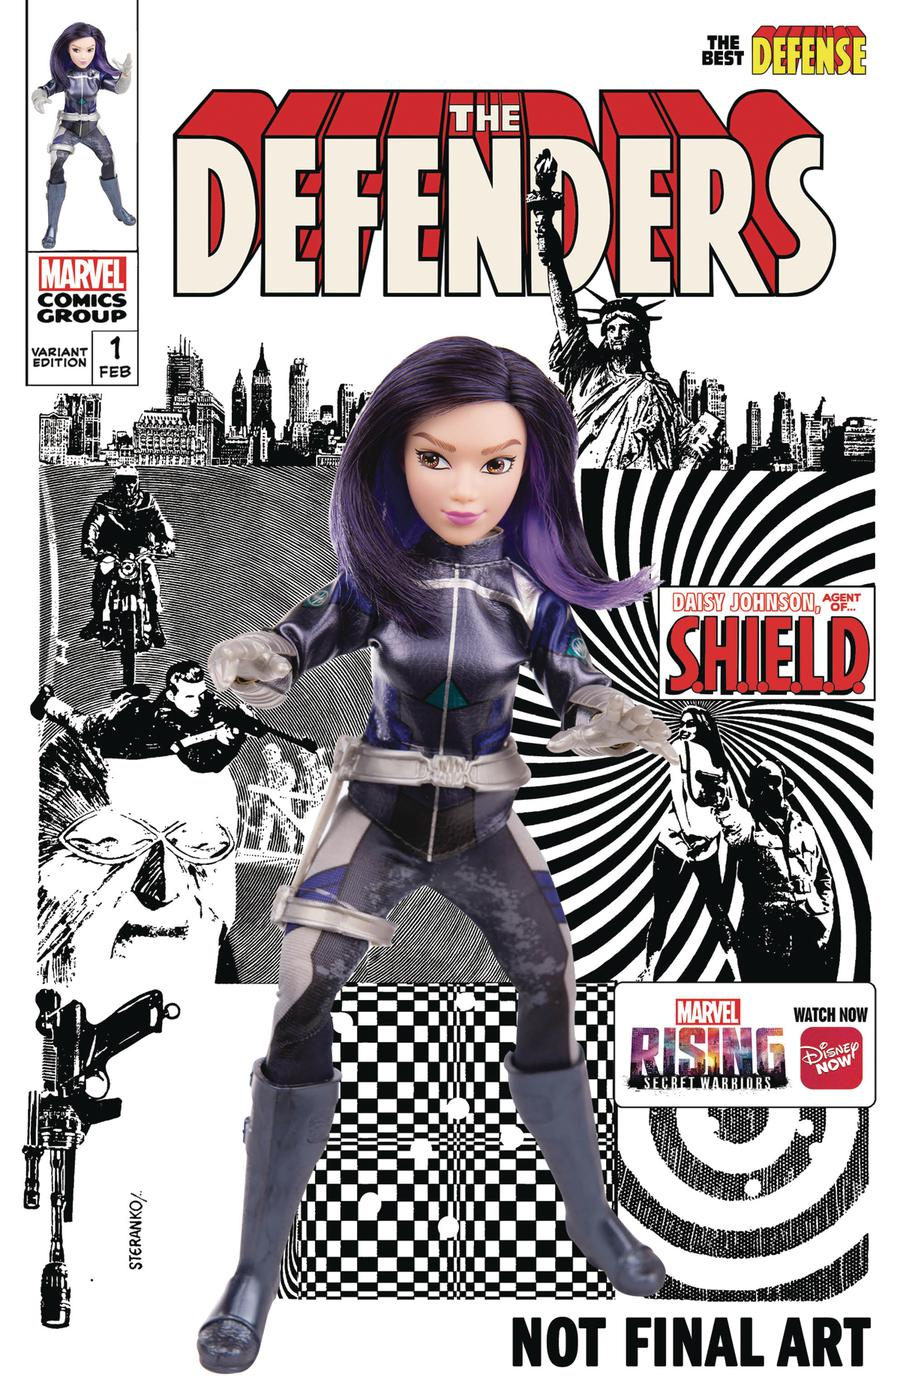 Defenders Best Defense #1 Cover C Variant Marvel Rising Action Doll Homage Cover (Best Defense Part 5)